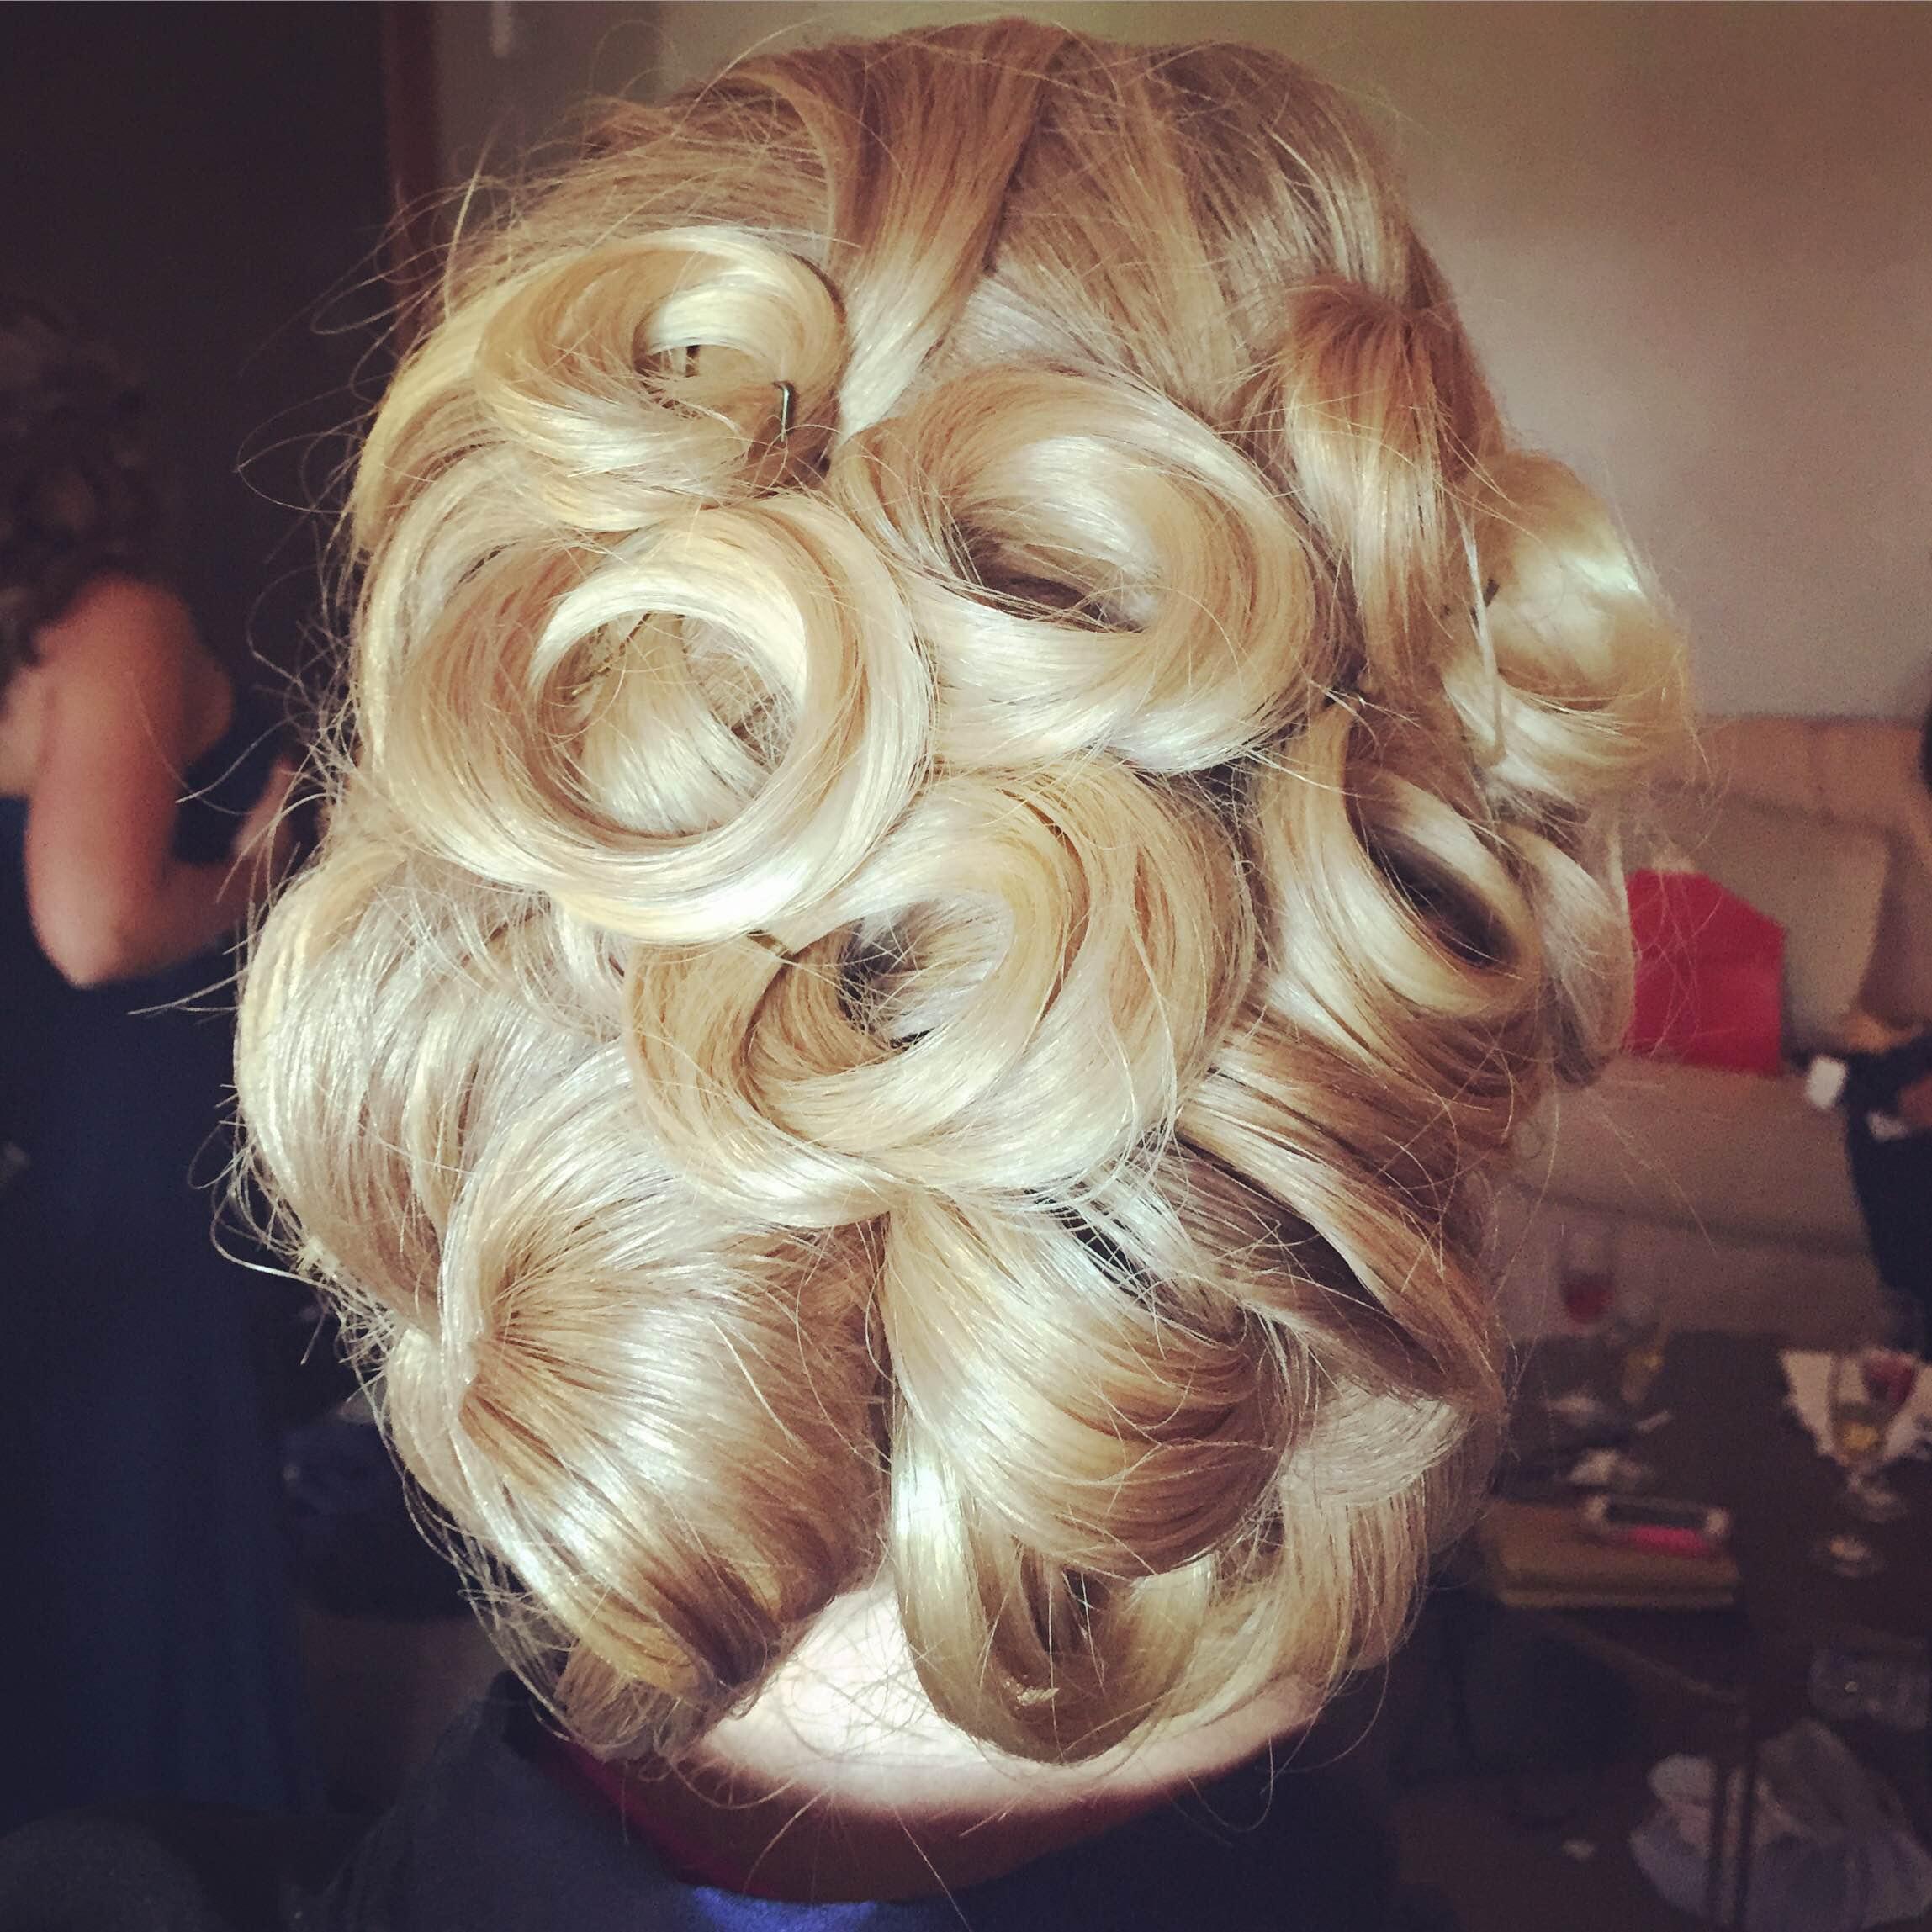 Hair & Makeup Artistry